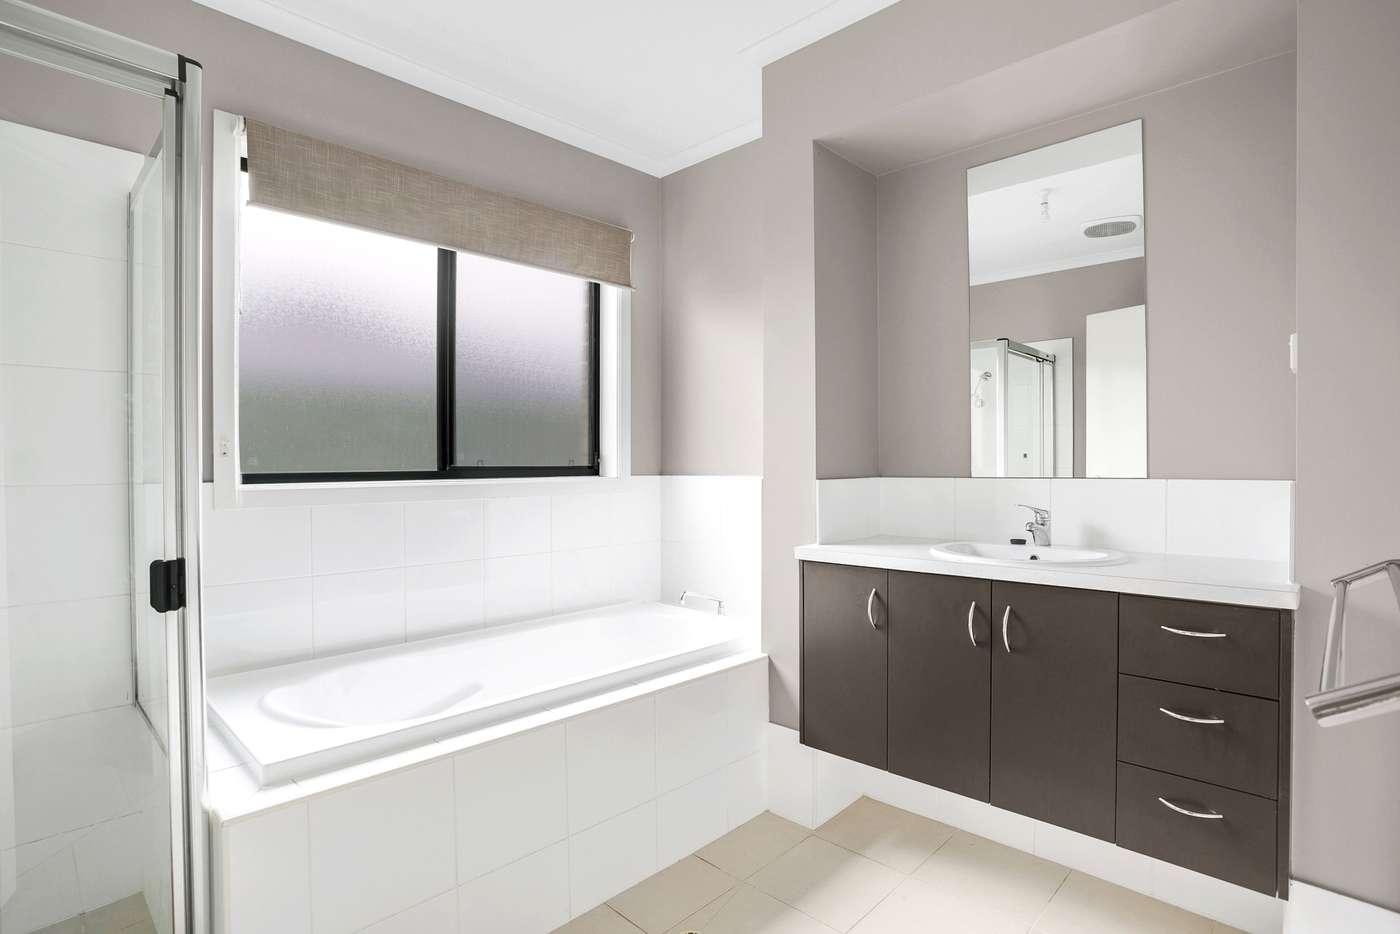 Fifth view of Homely house listing, 46 Barton Circuit, Mount Barker SA 5251